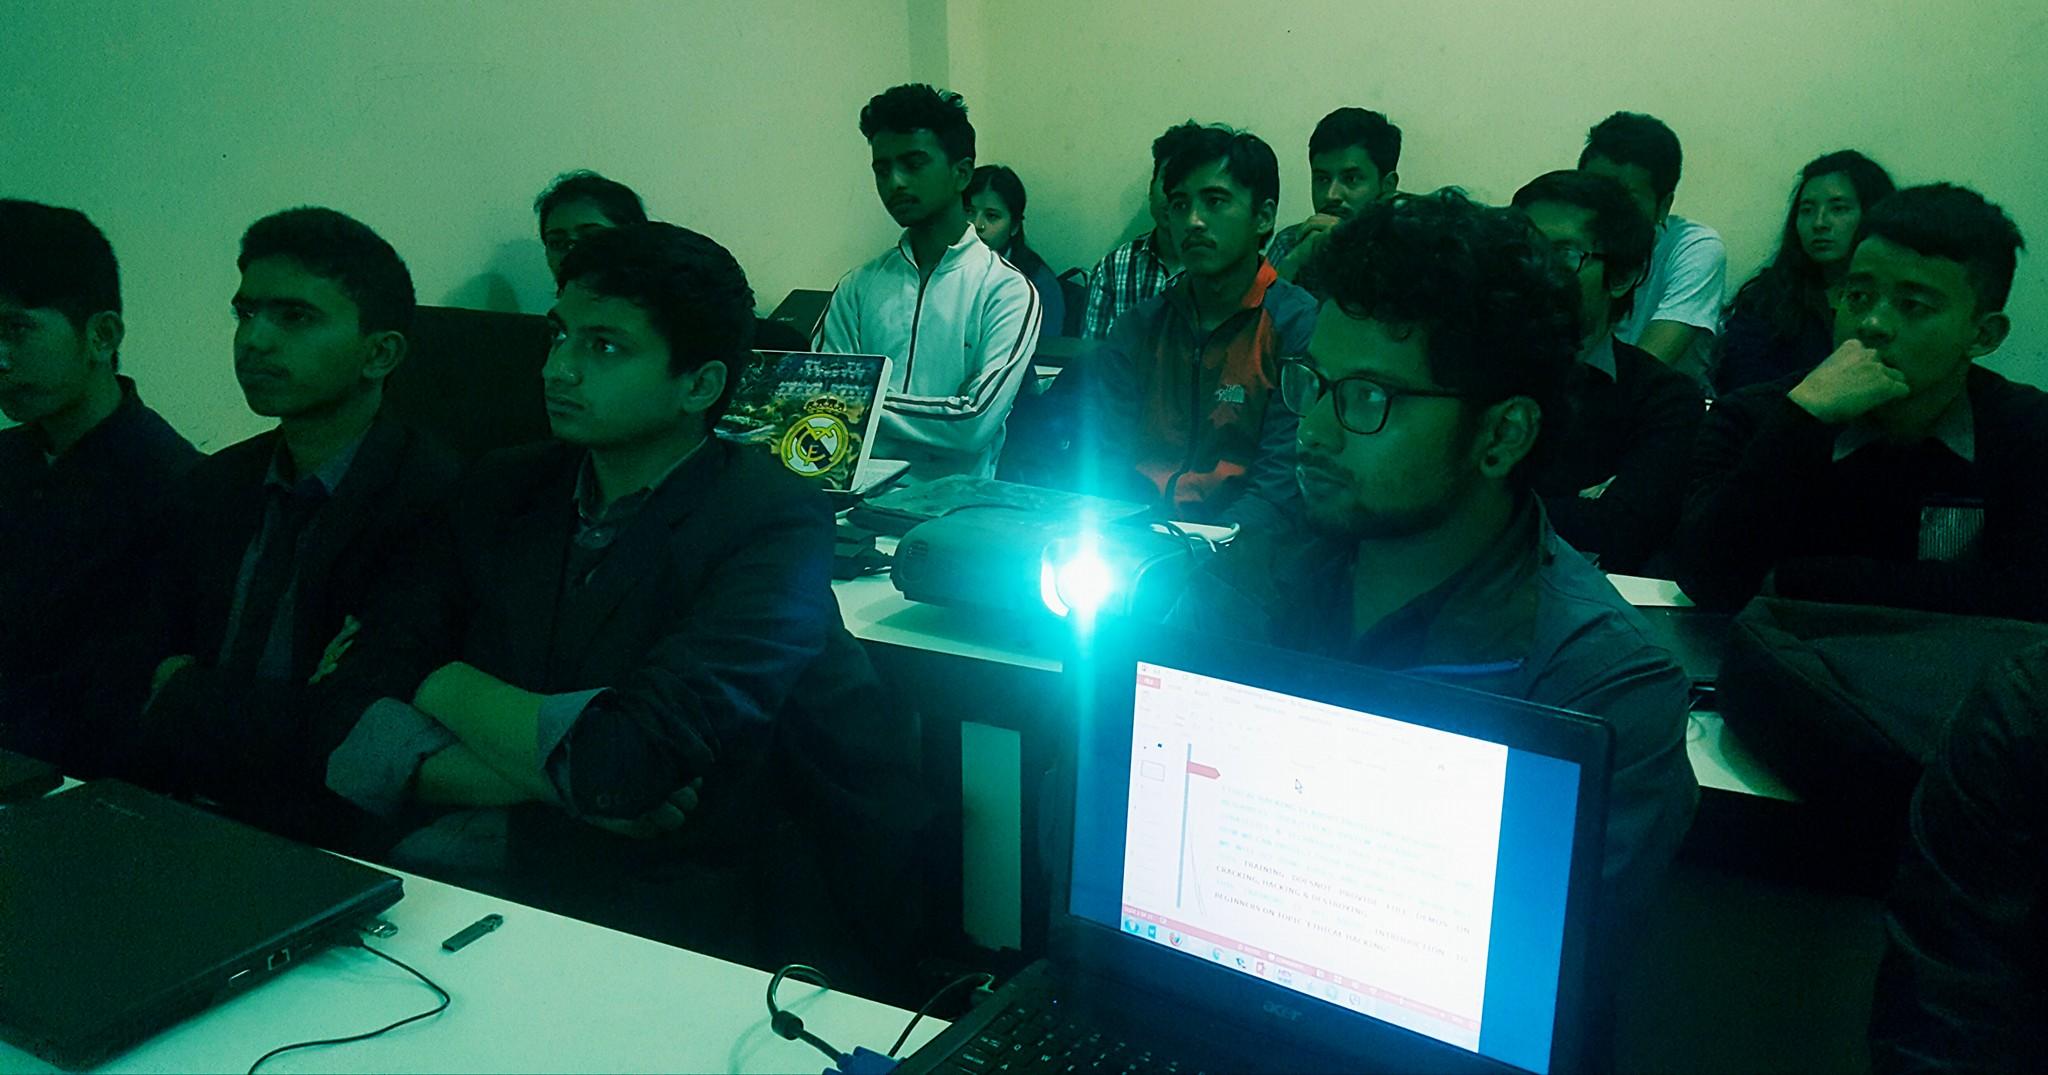 Ethical Hacking Workshop pokhara nepal 2017 bijay acharya.jpg